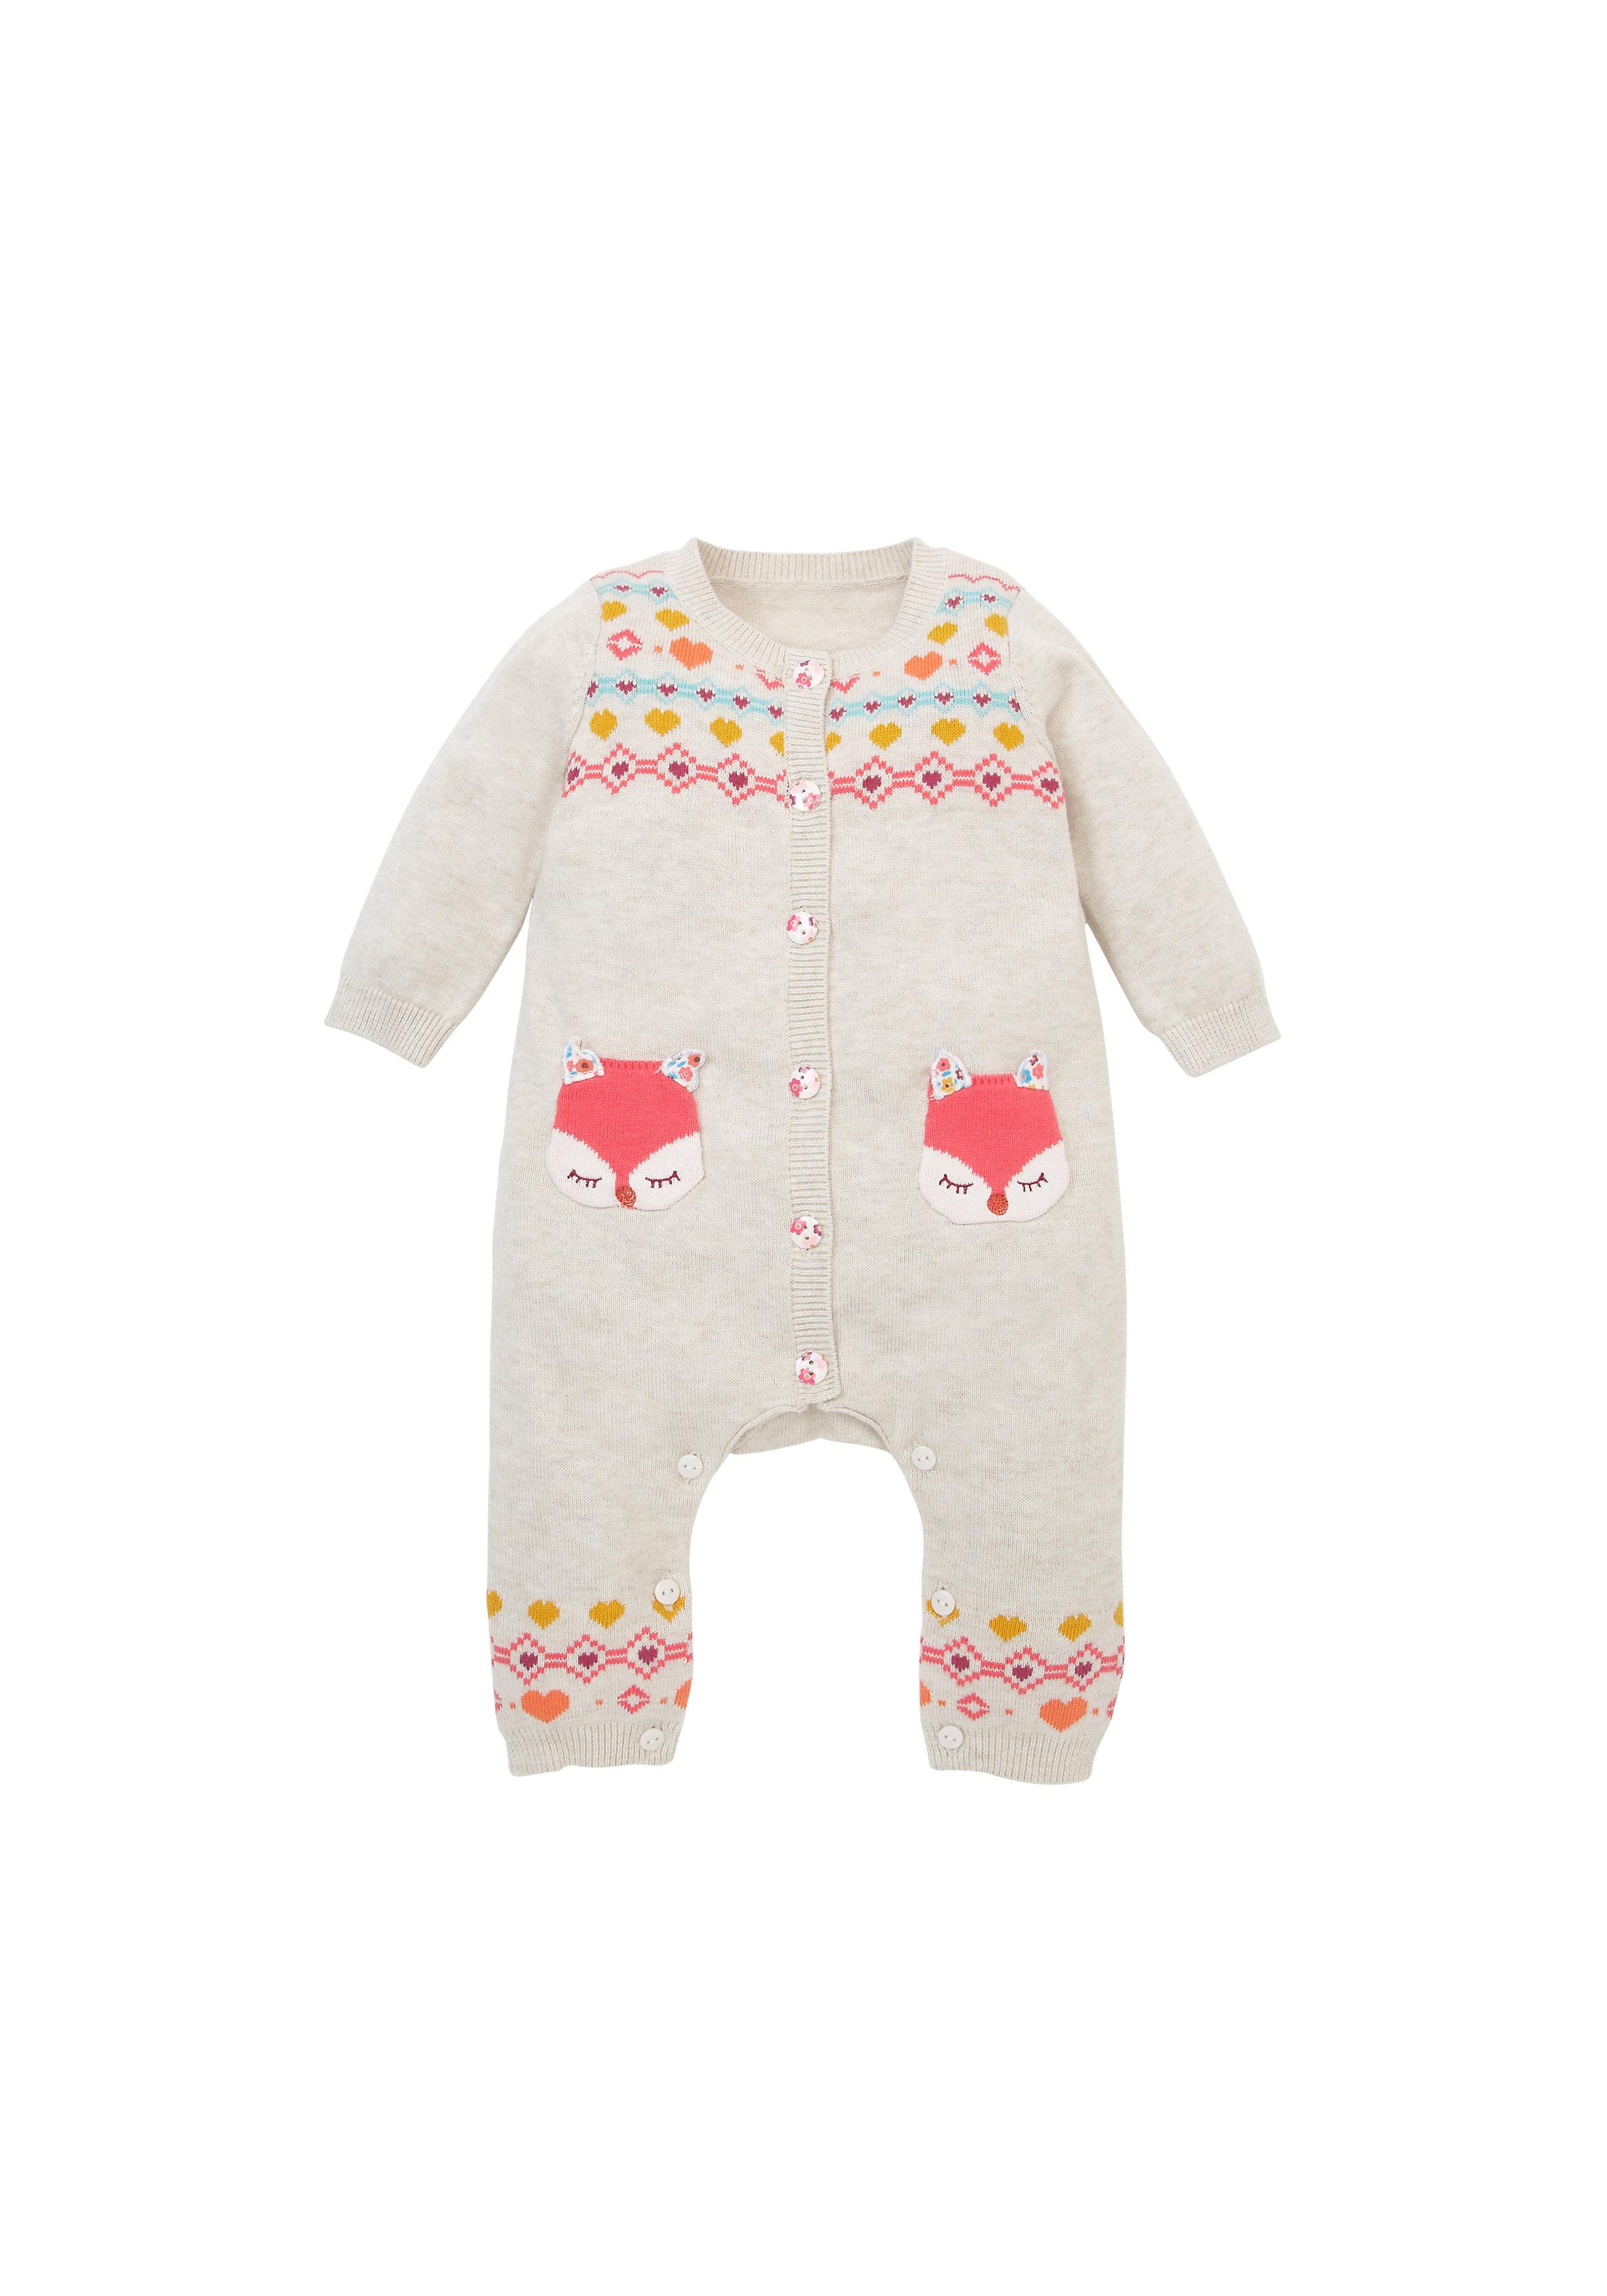 Mothercare | Girls Full Sleeves Romper Fox Patchwork - Beige